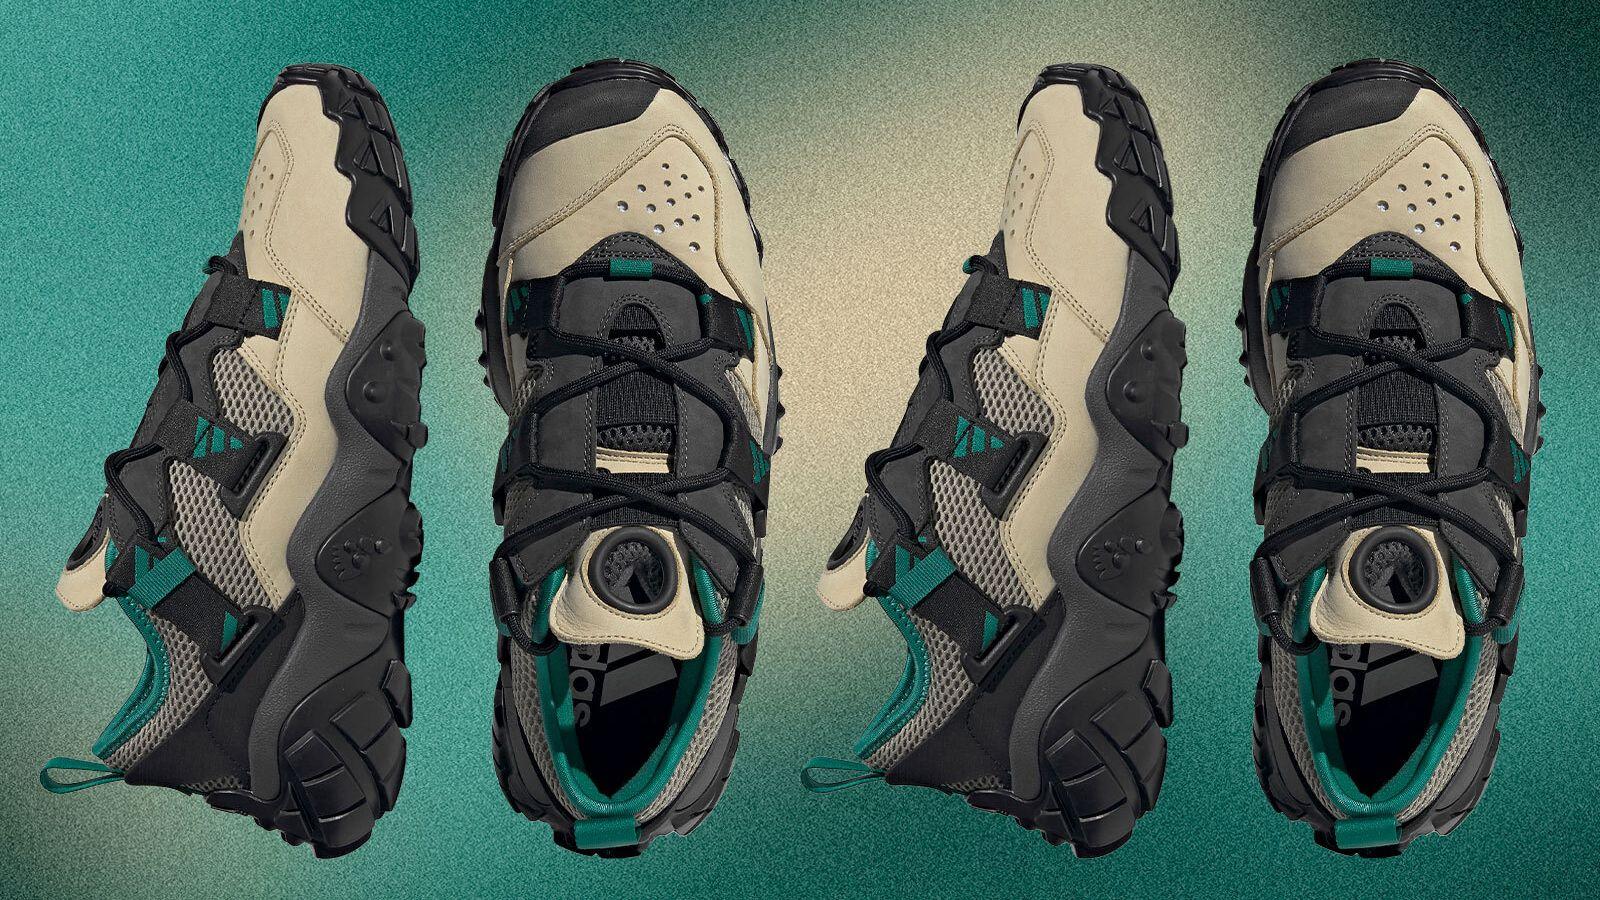 Adidas - FYW XTA - campaign